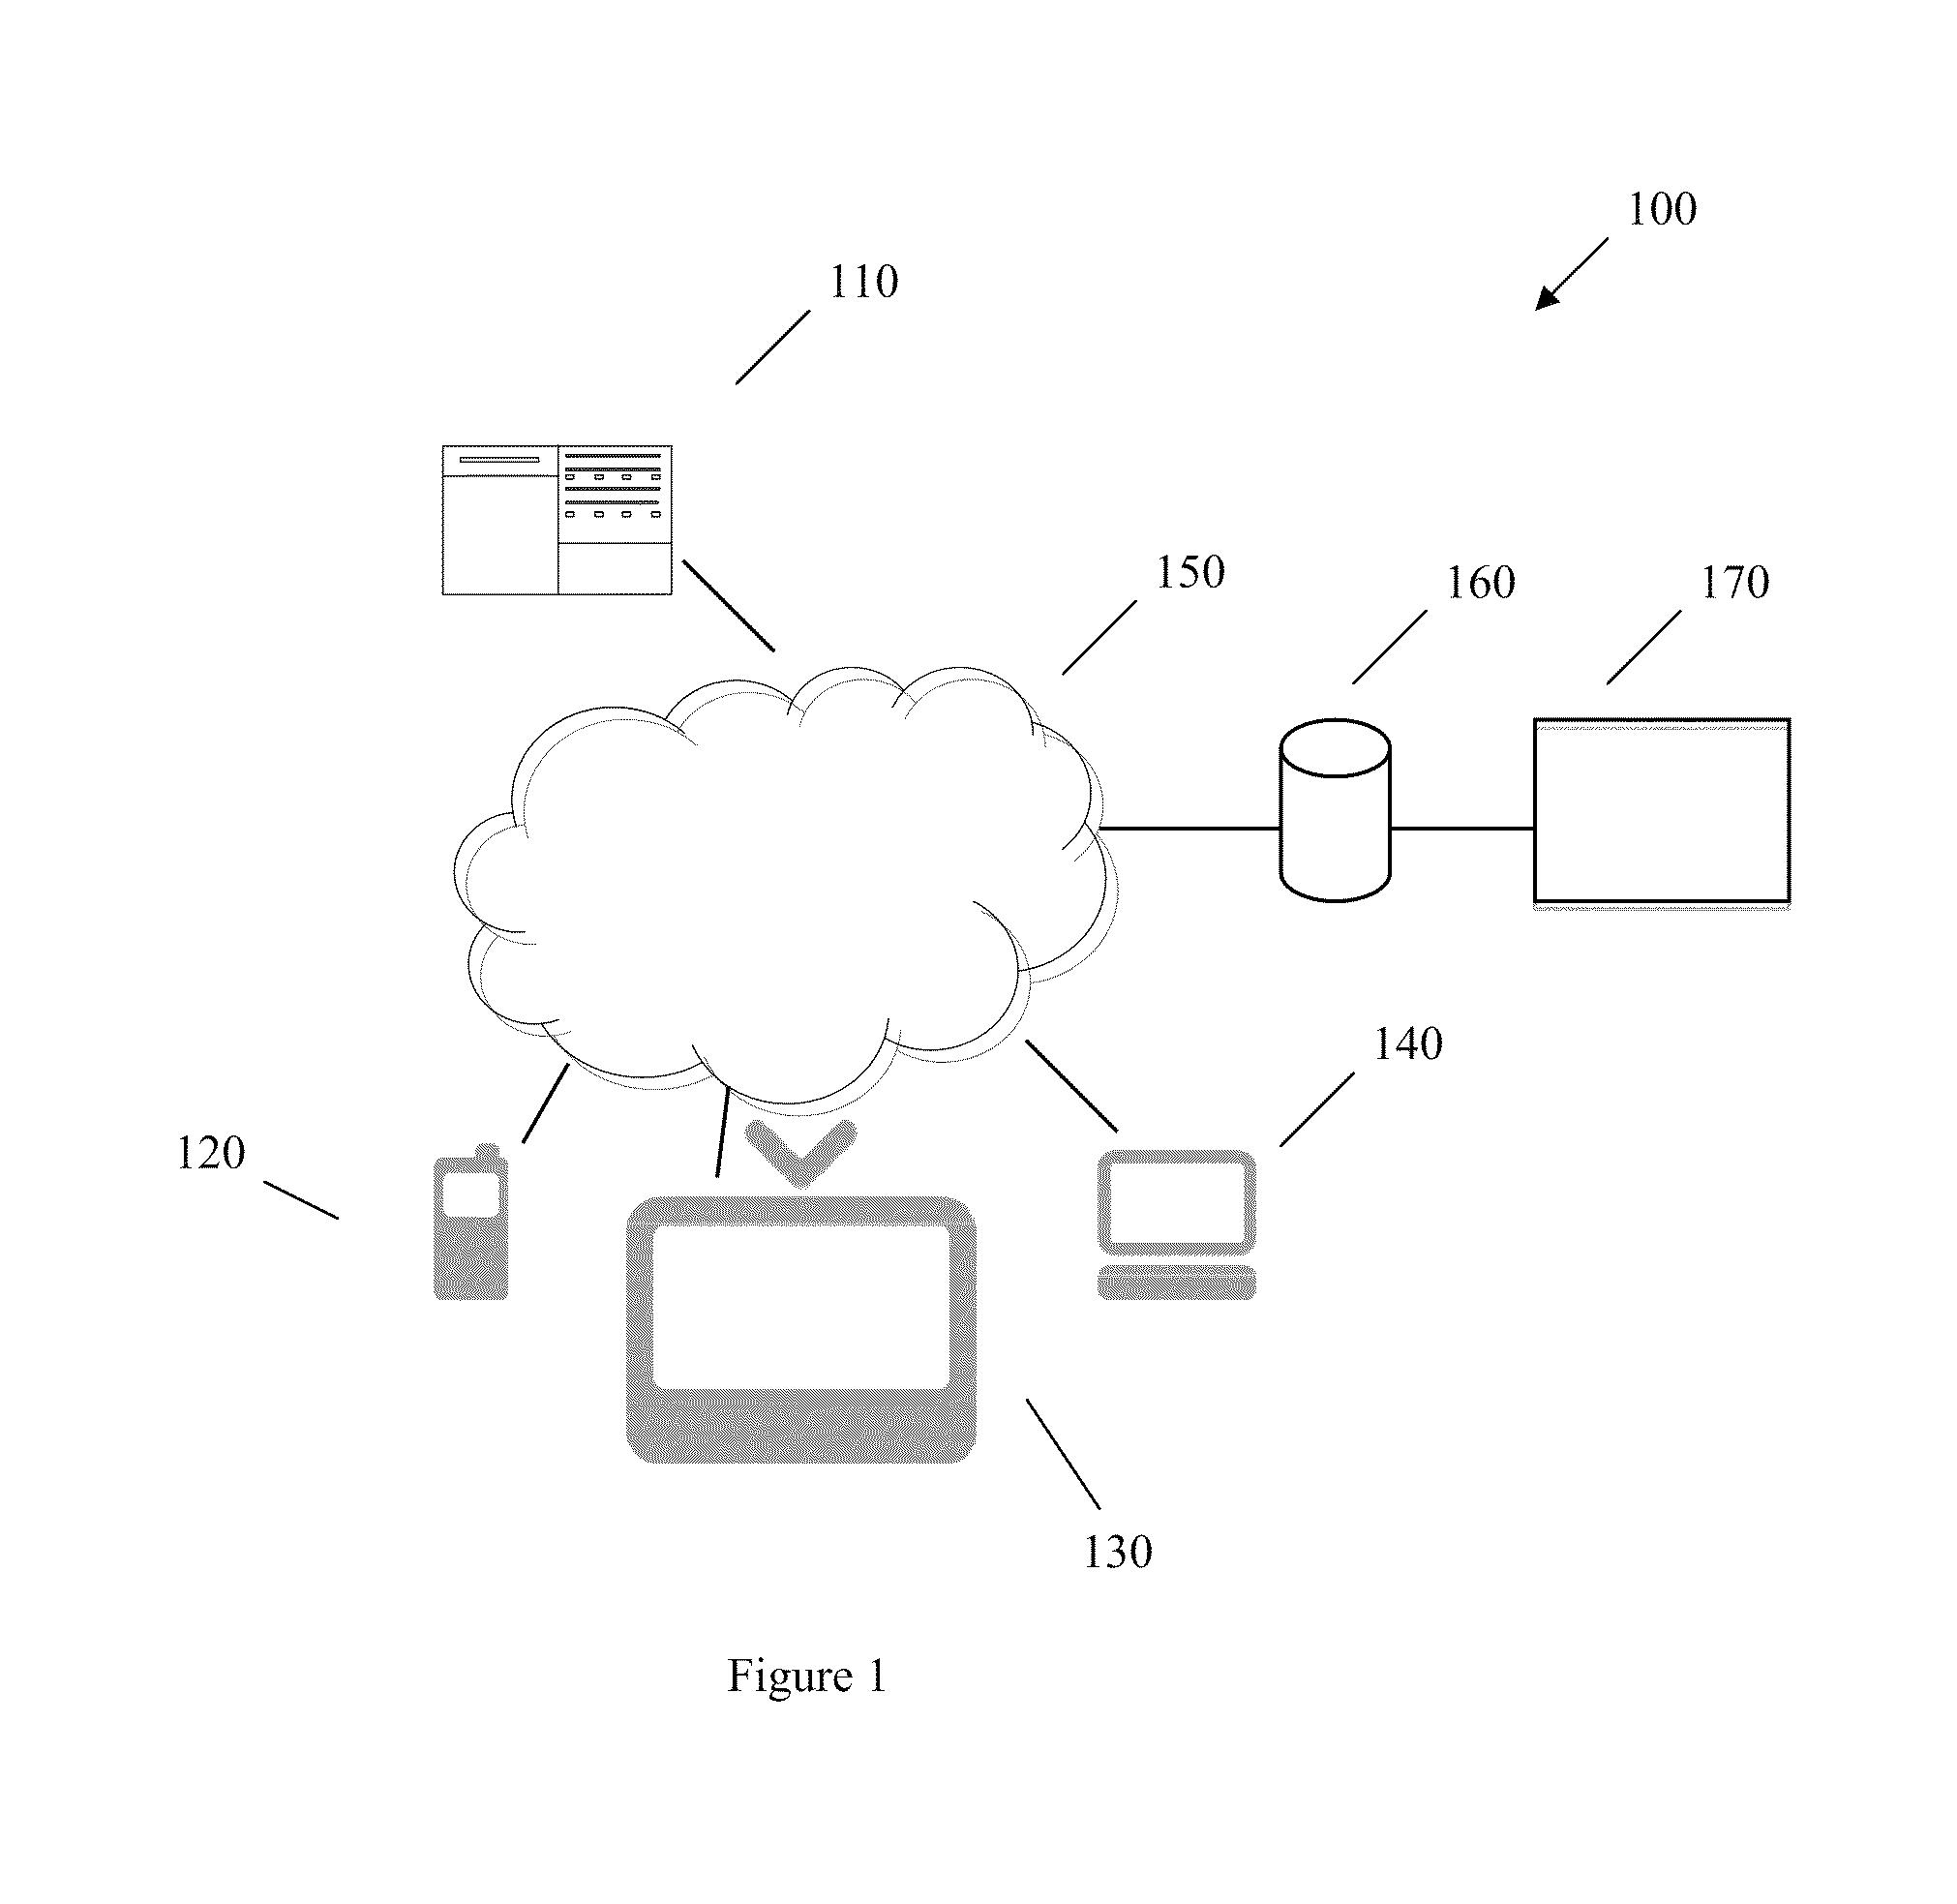 Patent US 9,166,714 B2 on